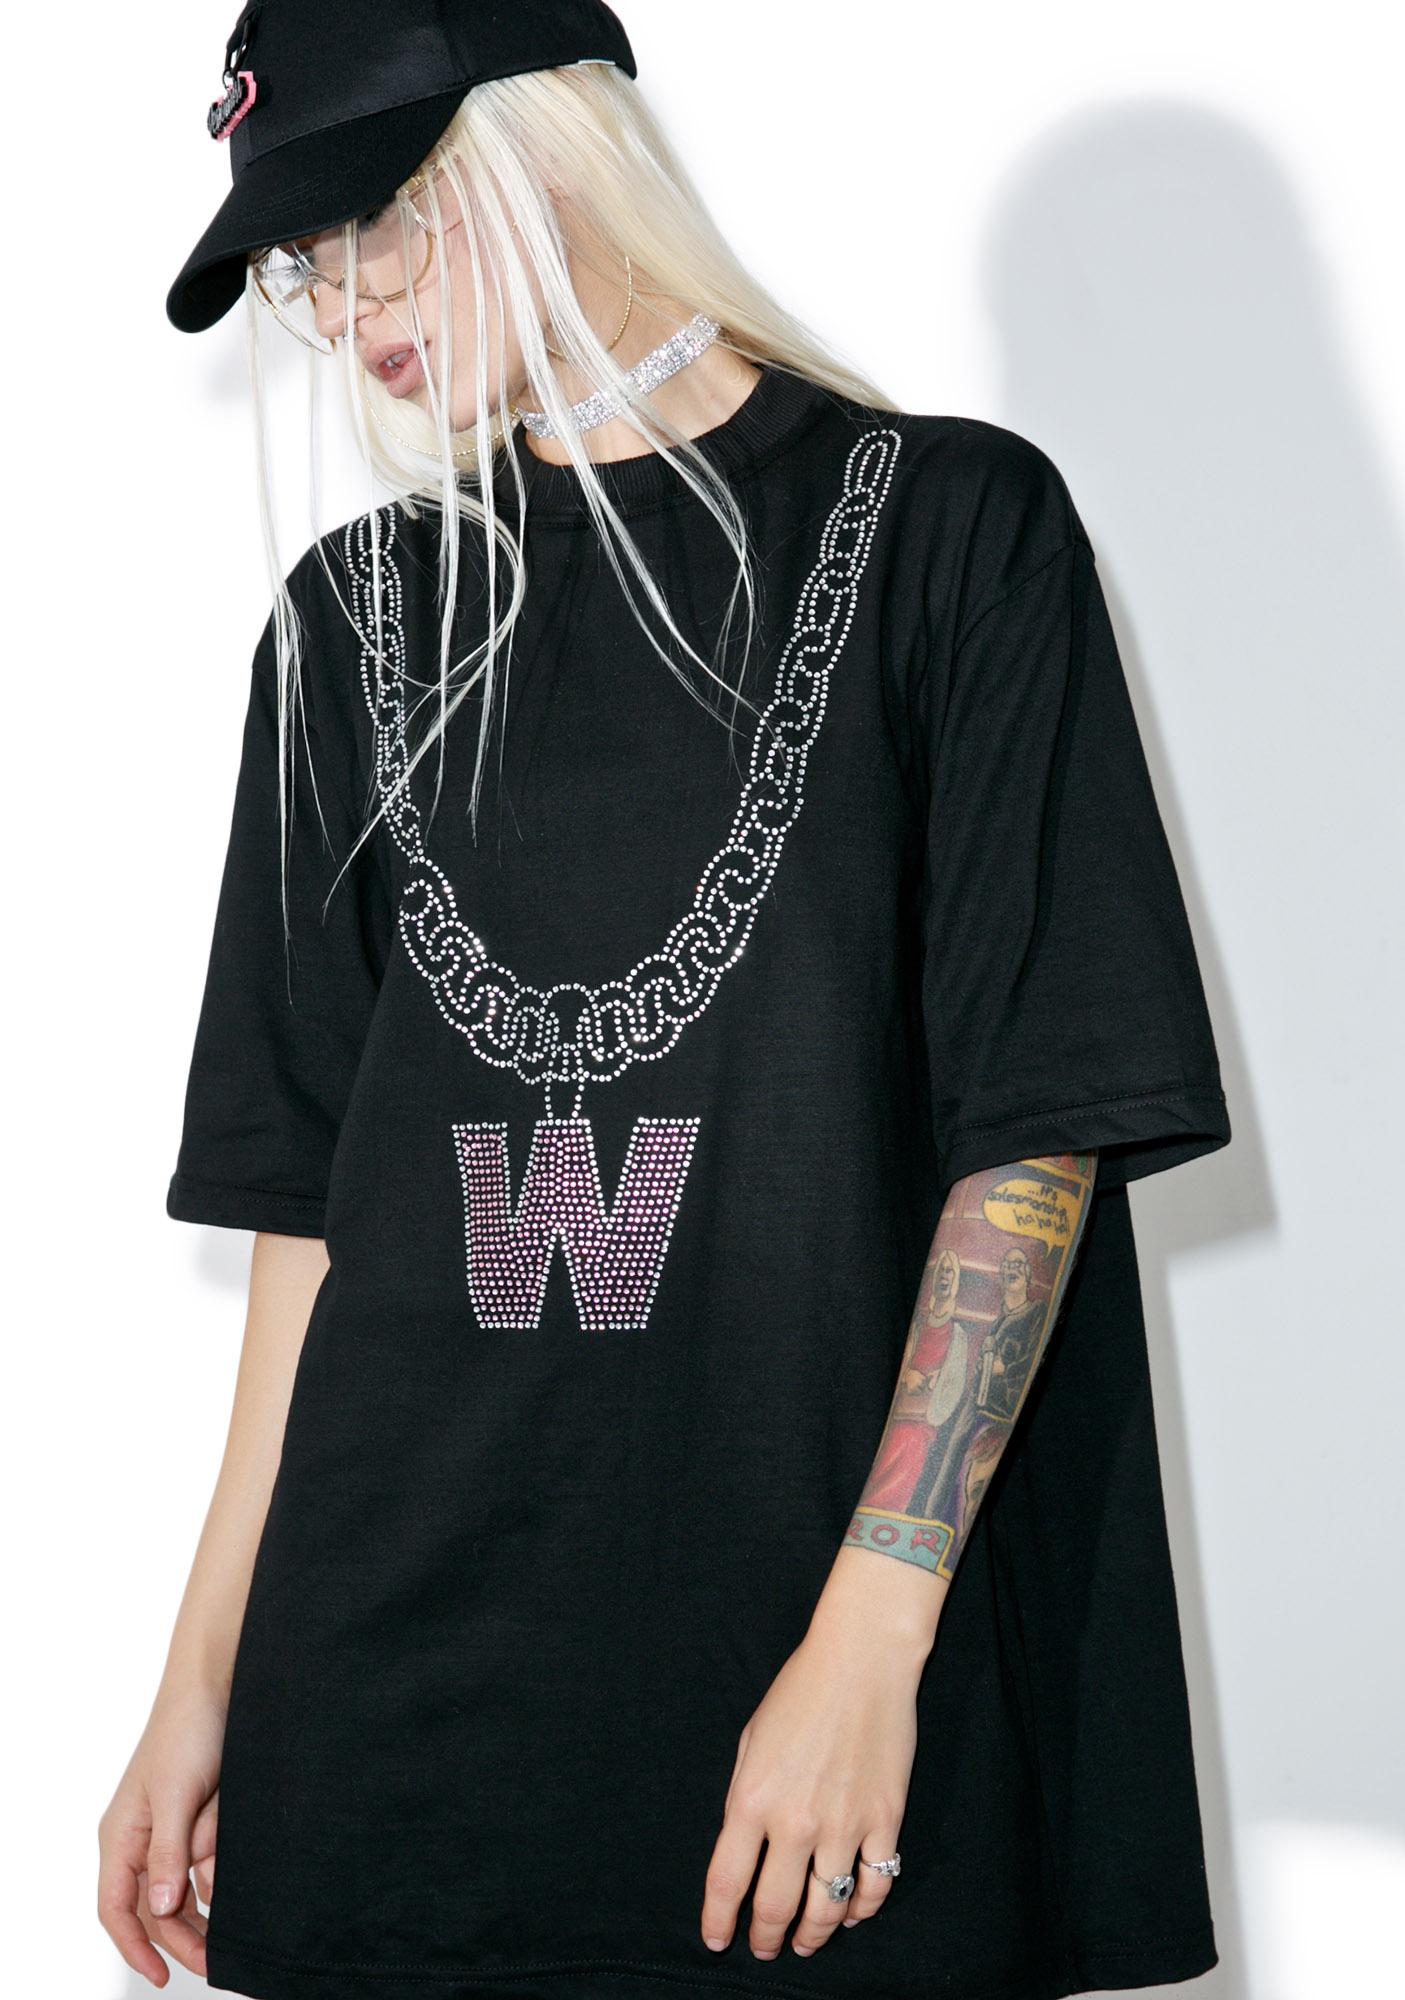 W.I.A Big Chain T-Shirt